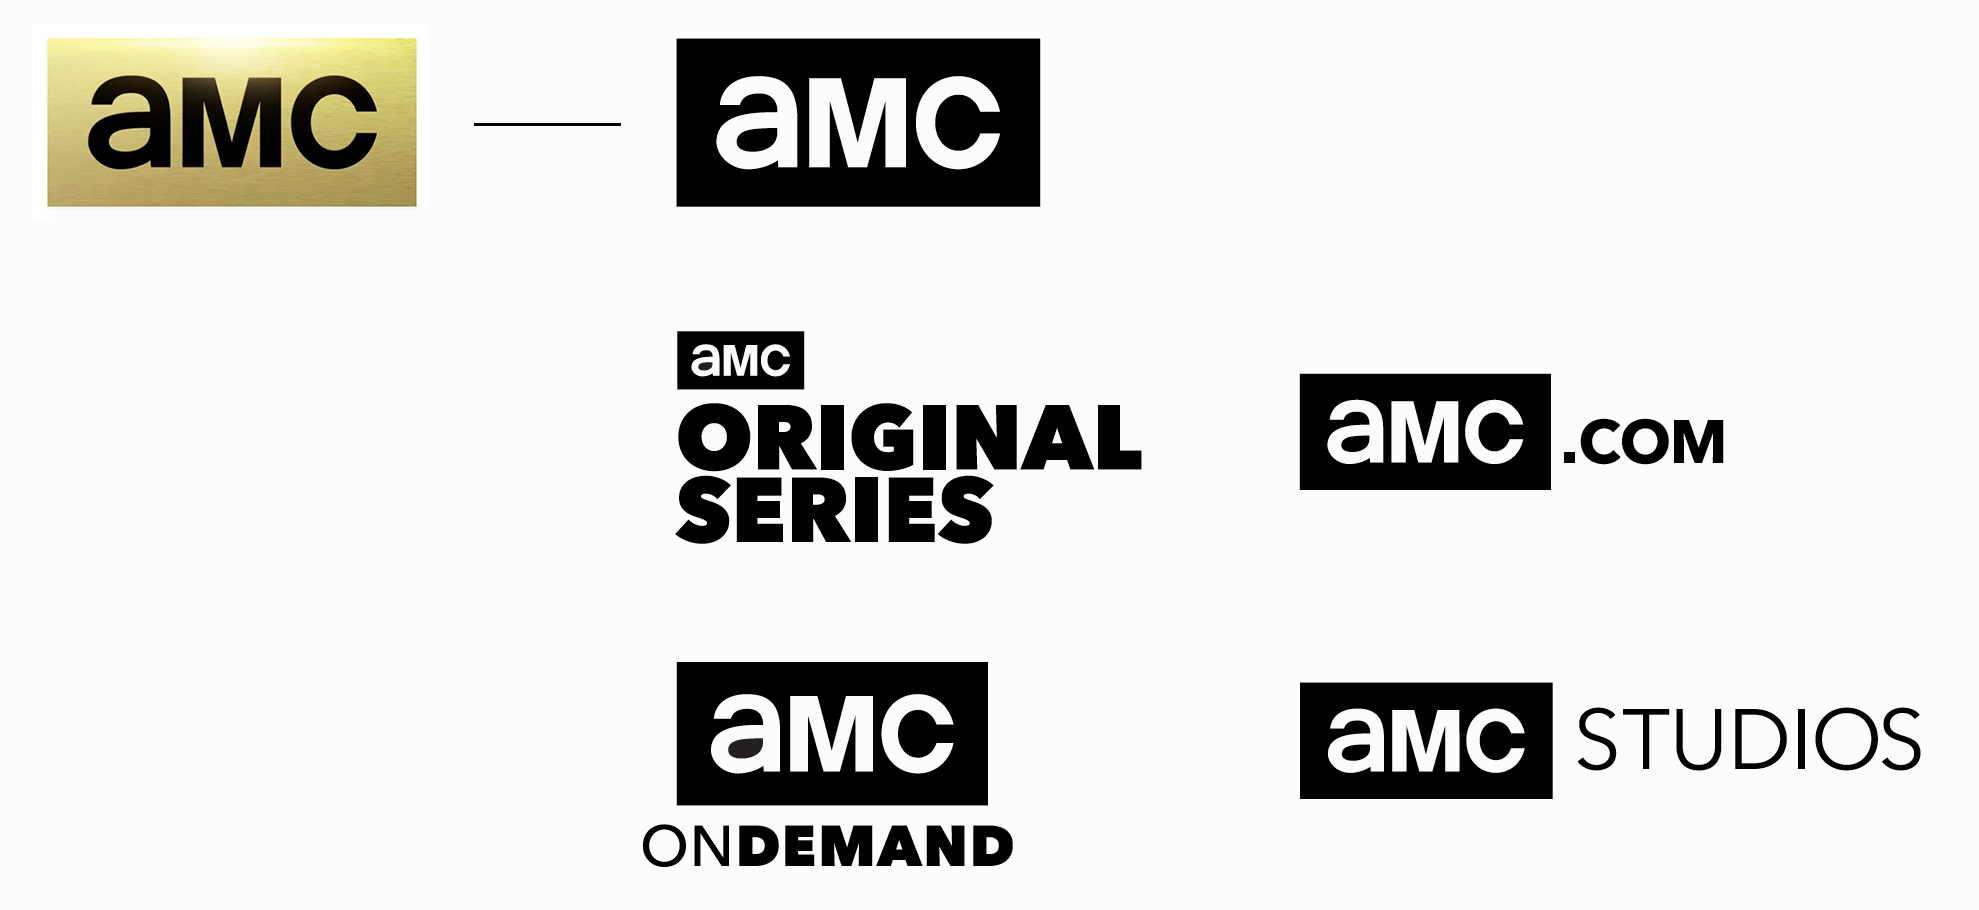 amc_logos.jpg